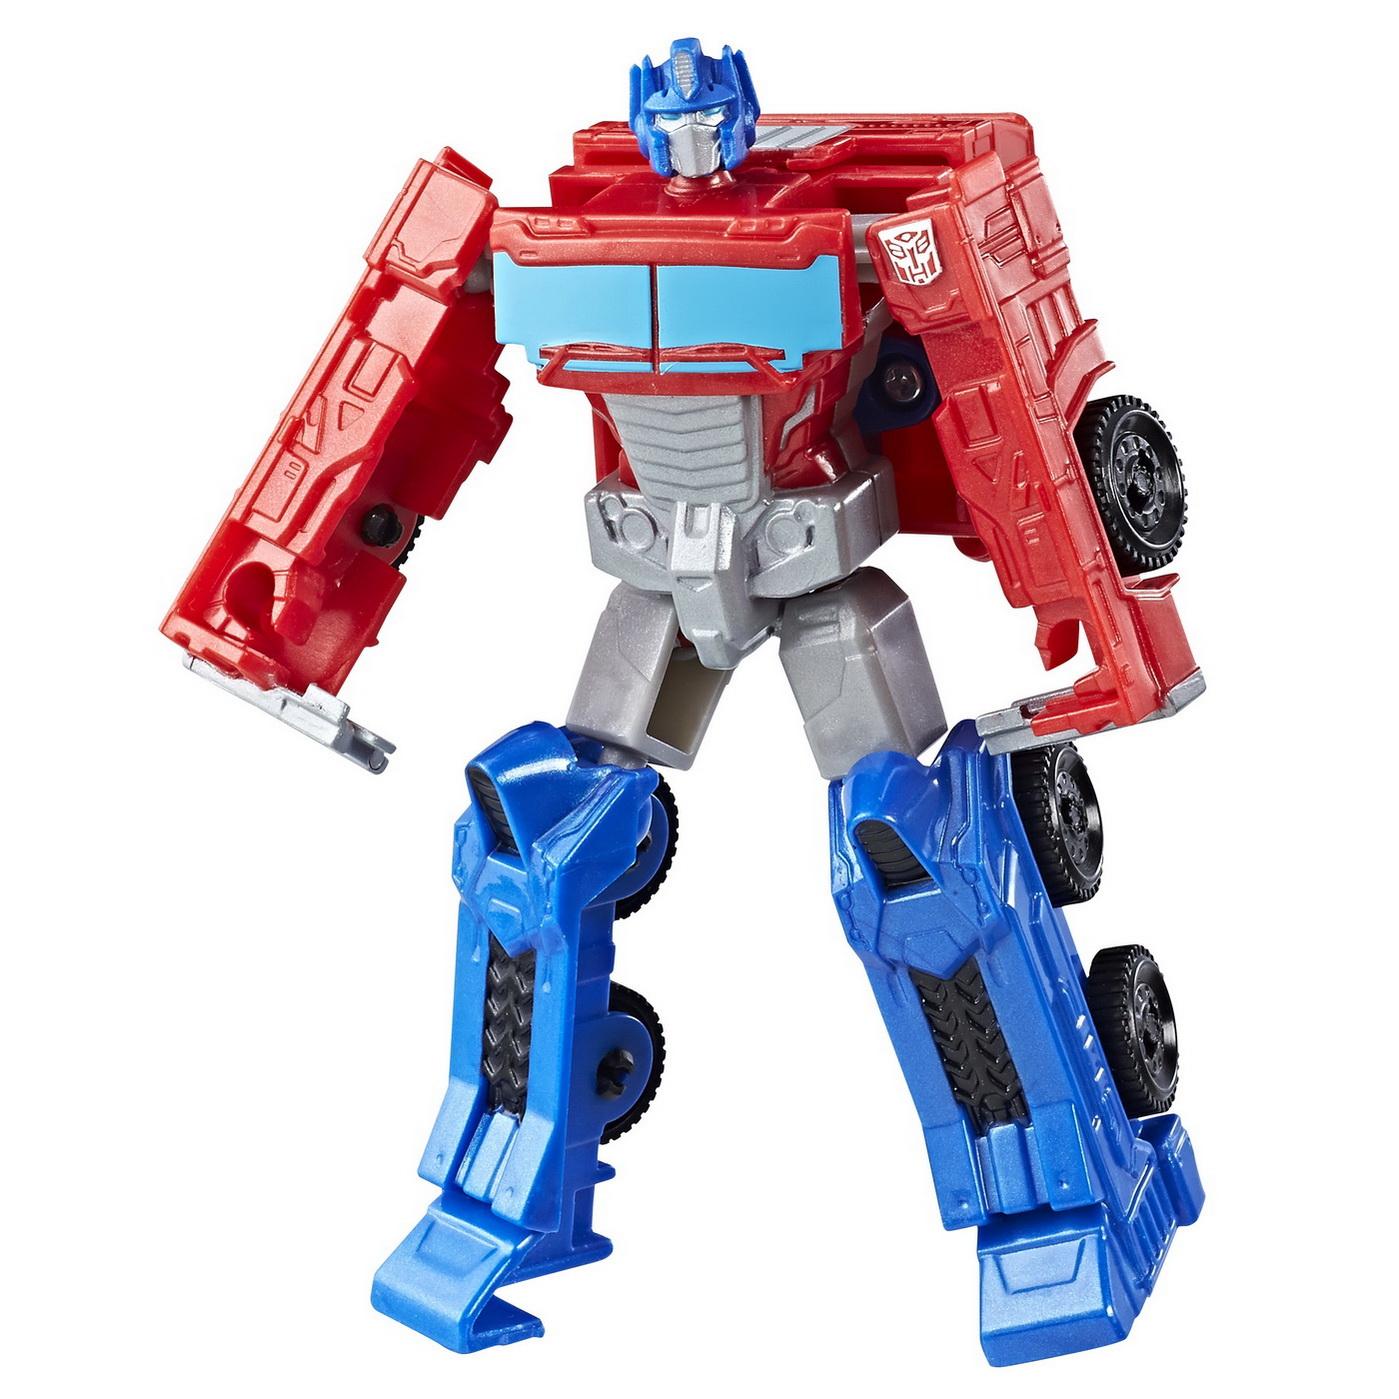 Jucarie - Transformers: Autobot Optimus Prime | Hasbro - 1